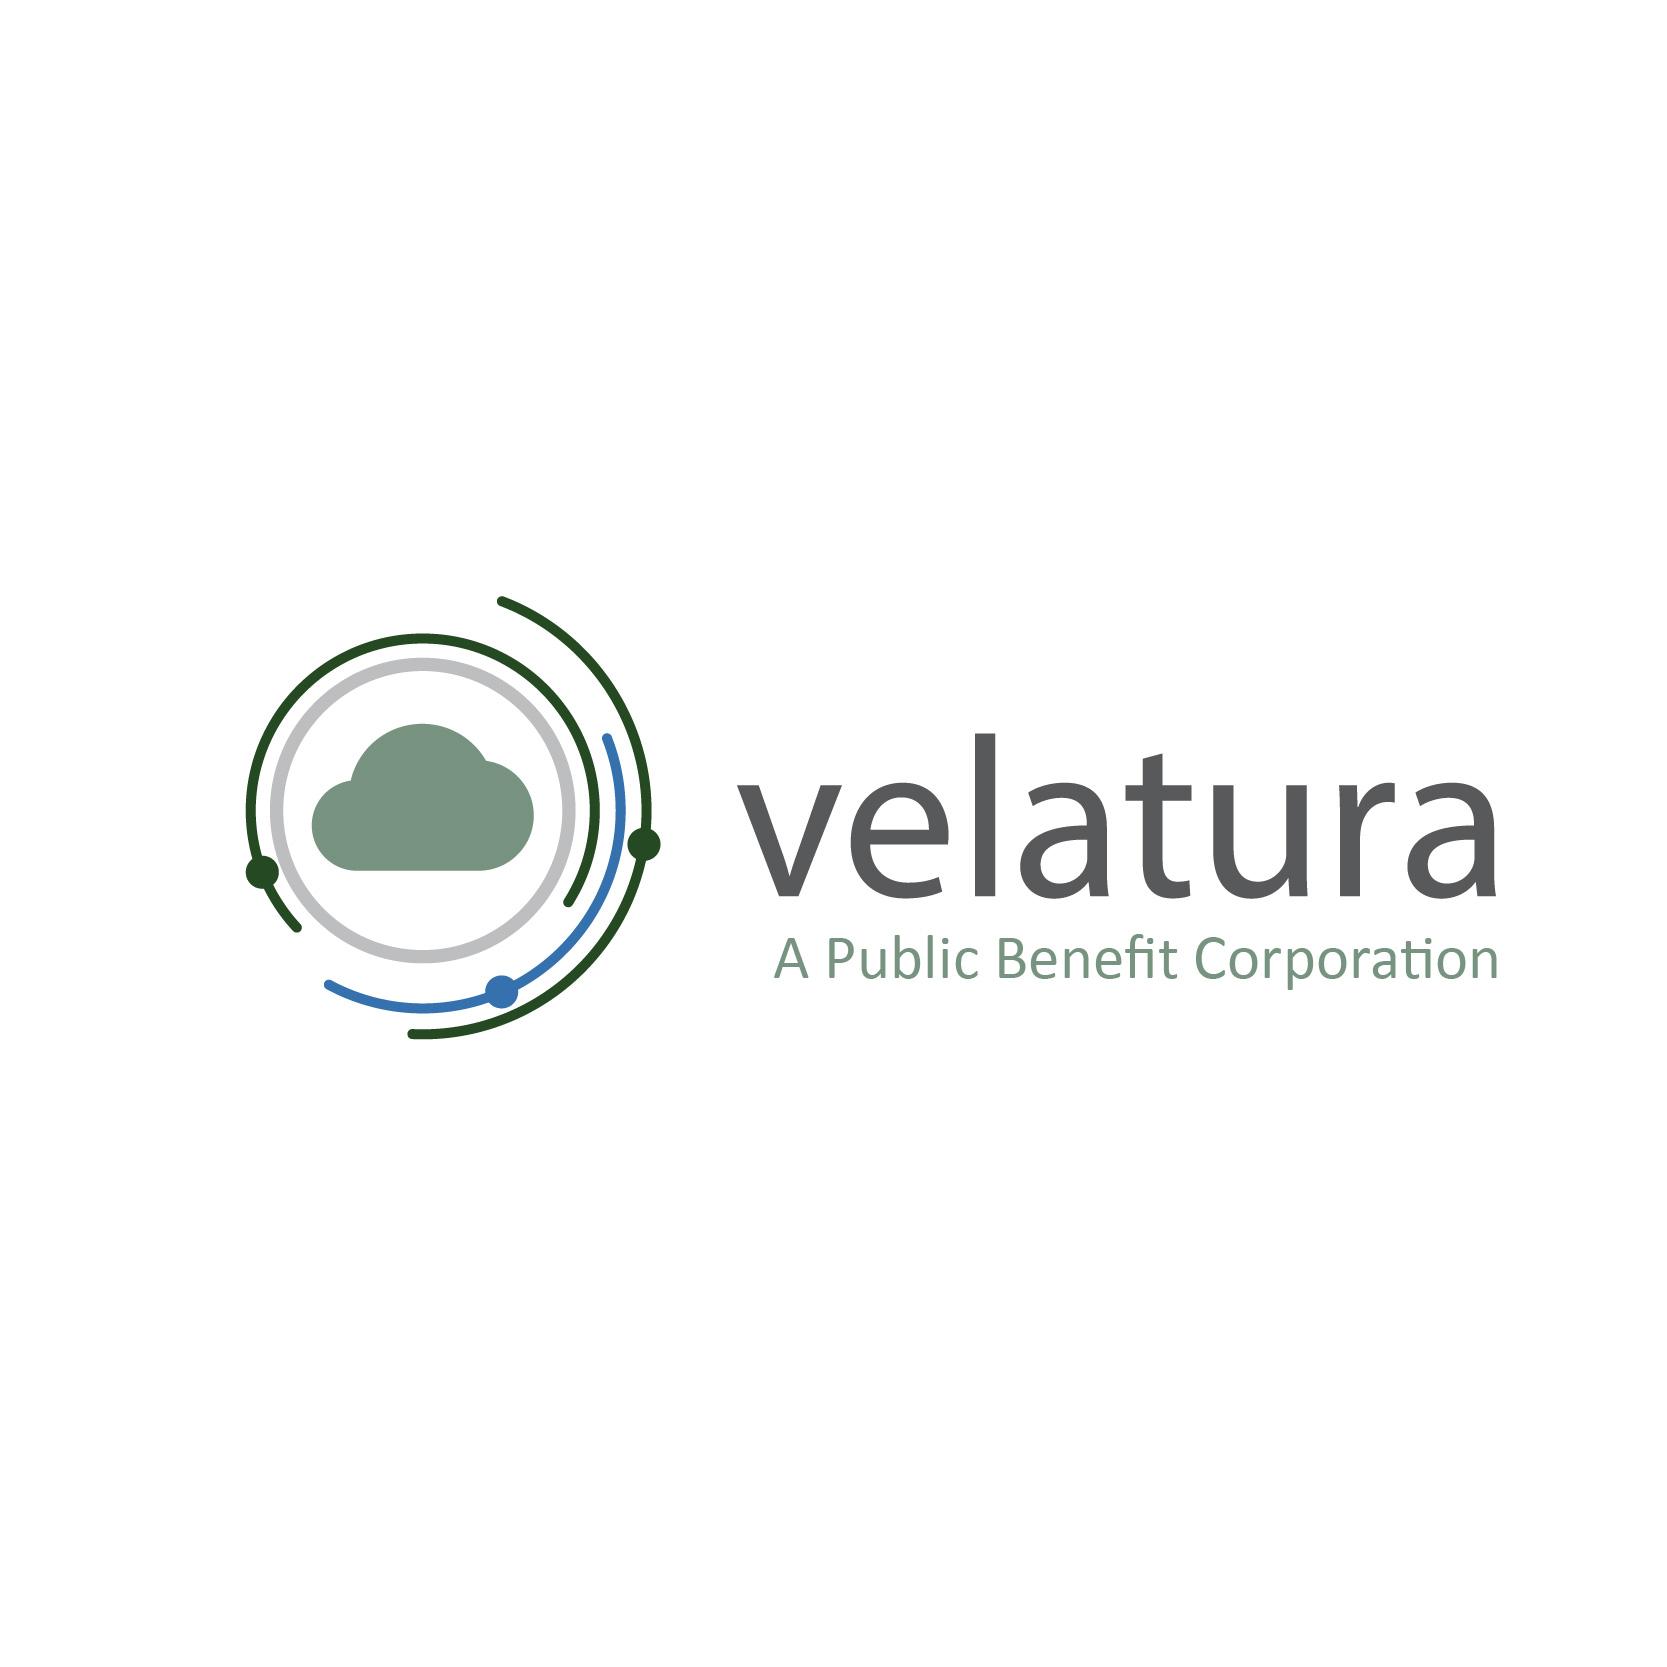 Velatura Public Benefit Corporation